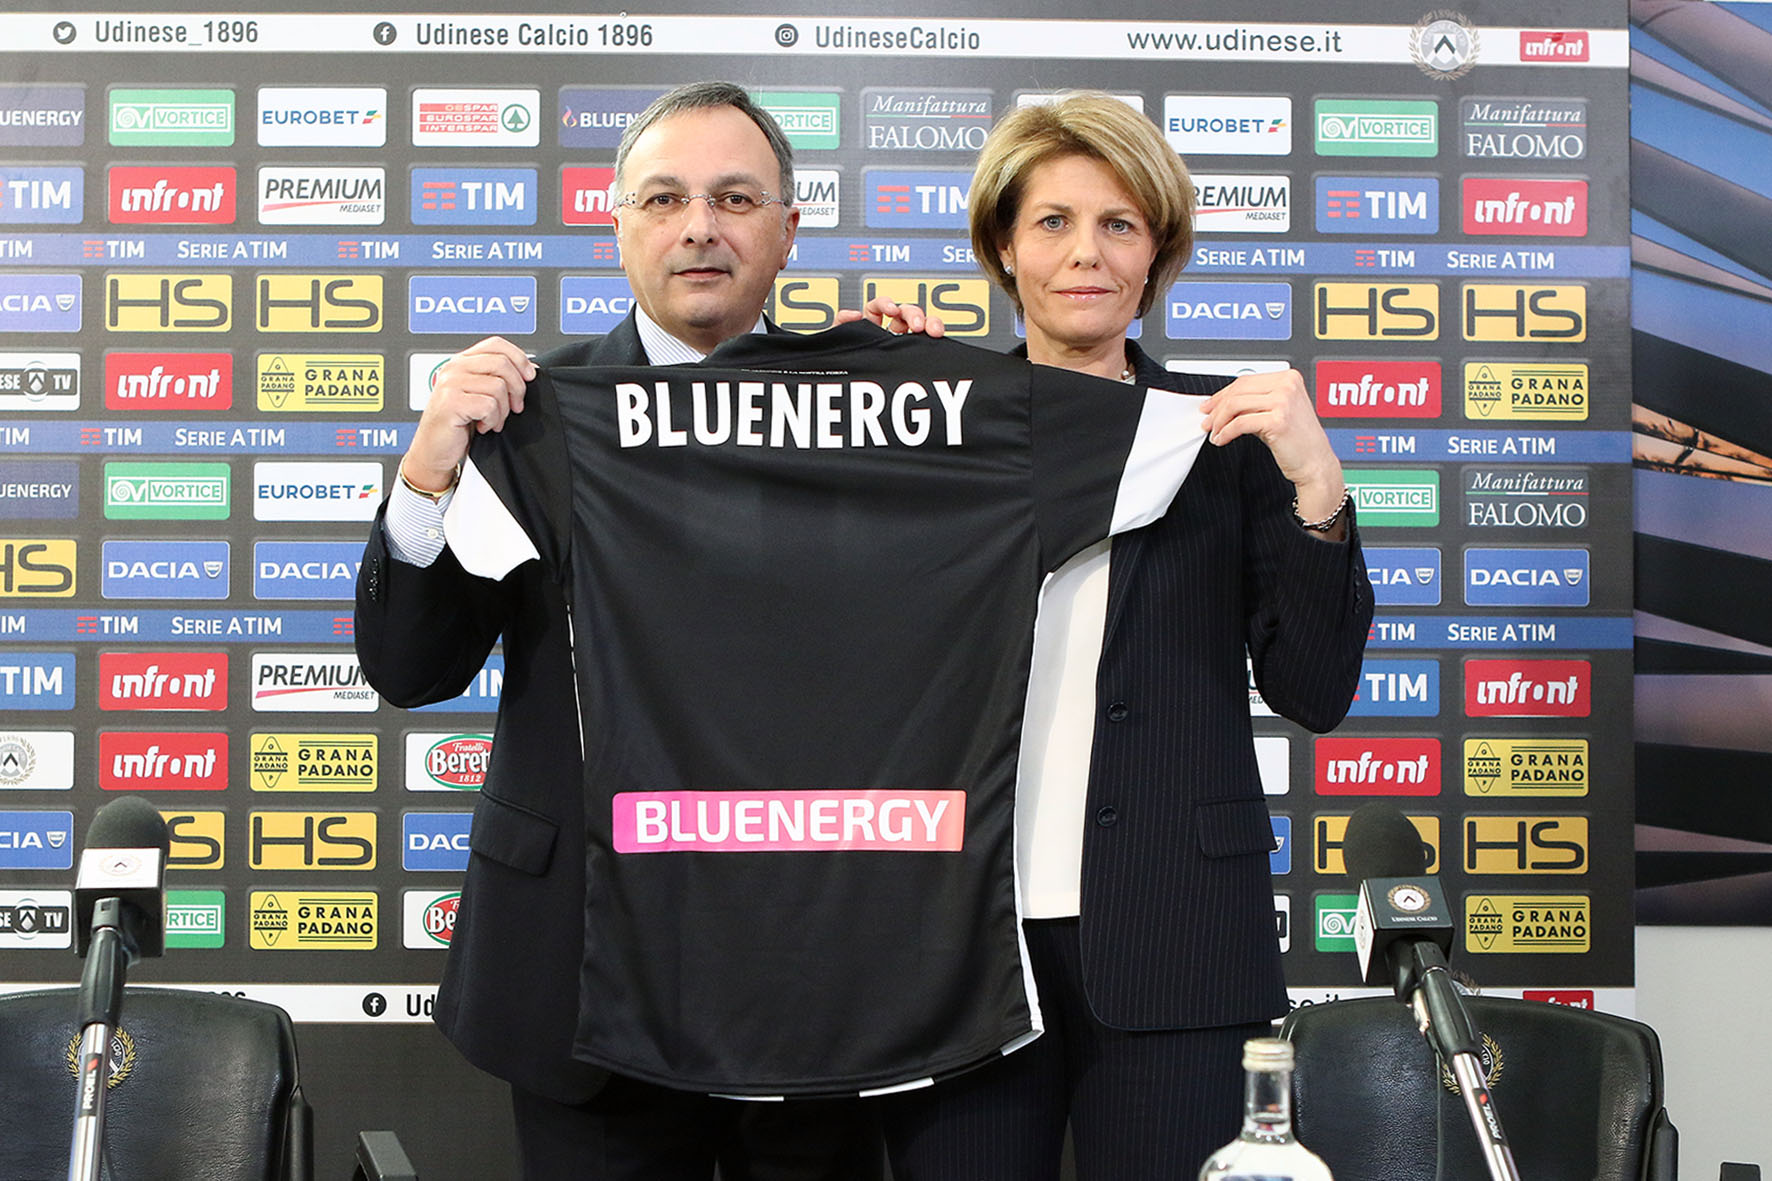 Bluenergy è Back Jersey Sponsor di Udinese Calcio